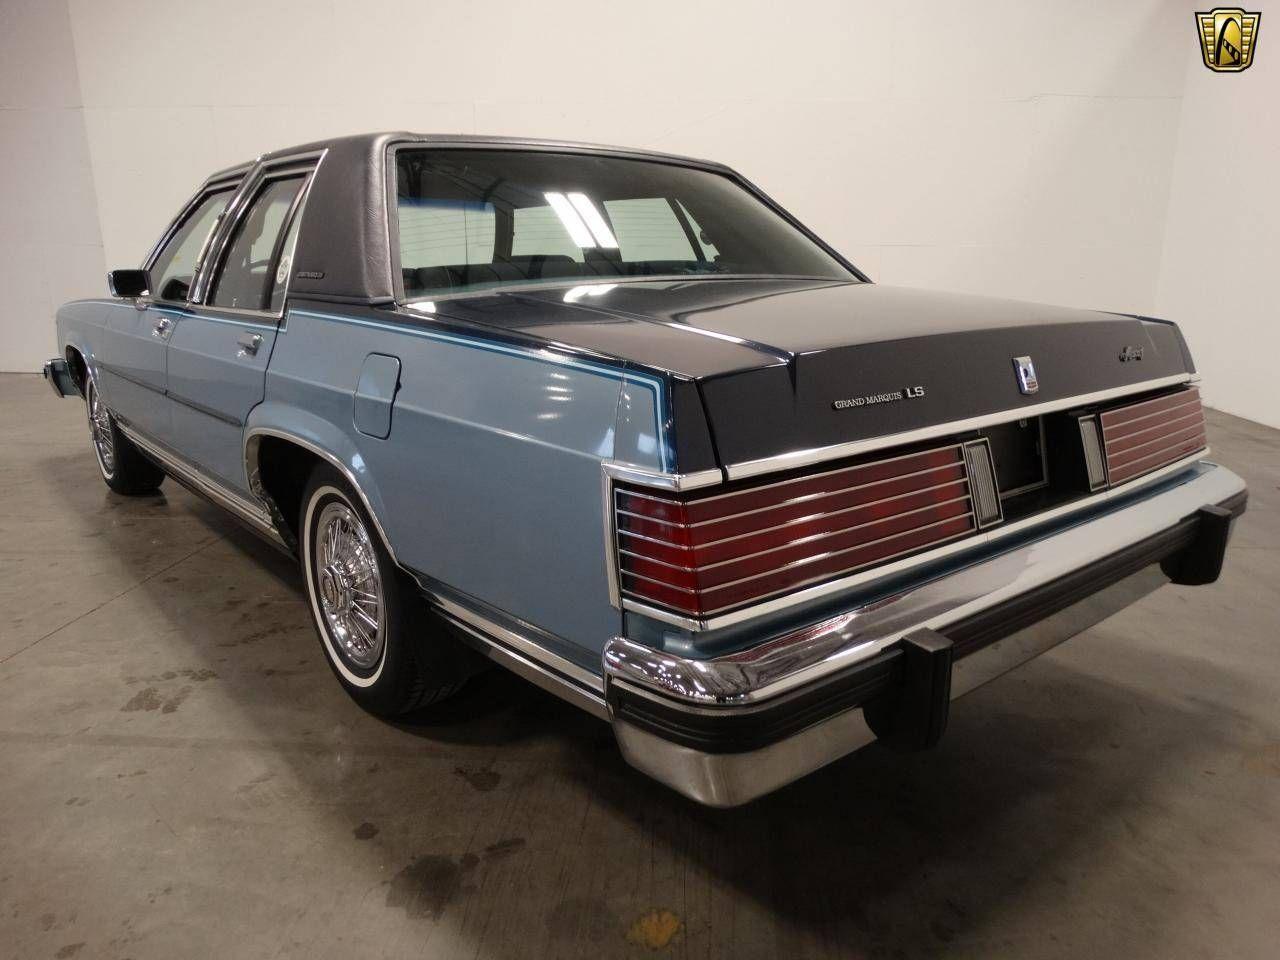 1985 Mercury Grand Marquis Sedan Grand Marquis Mercury Marquis Ford Motor Company